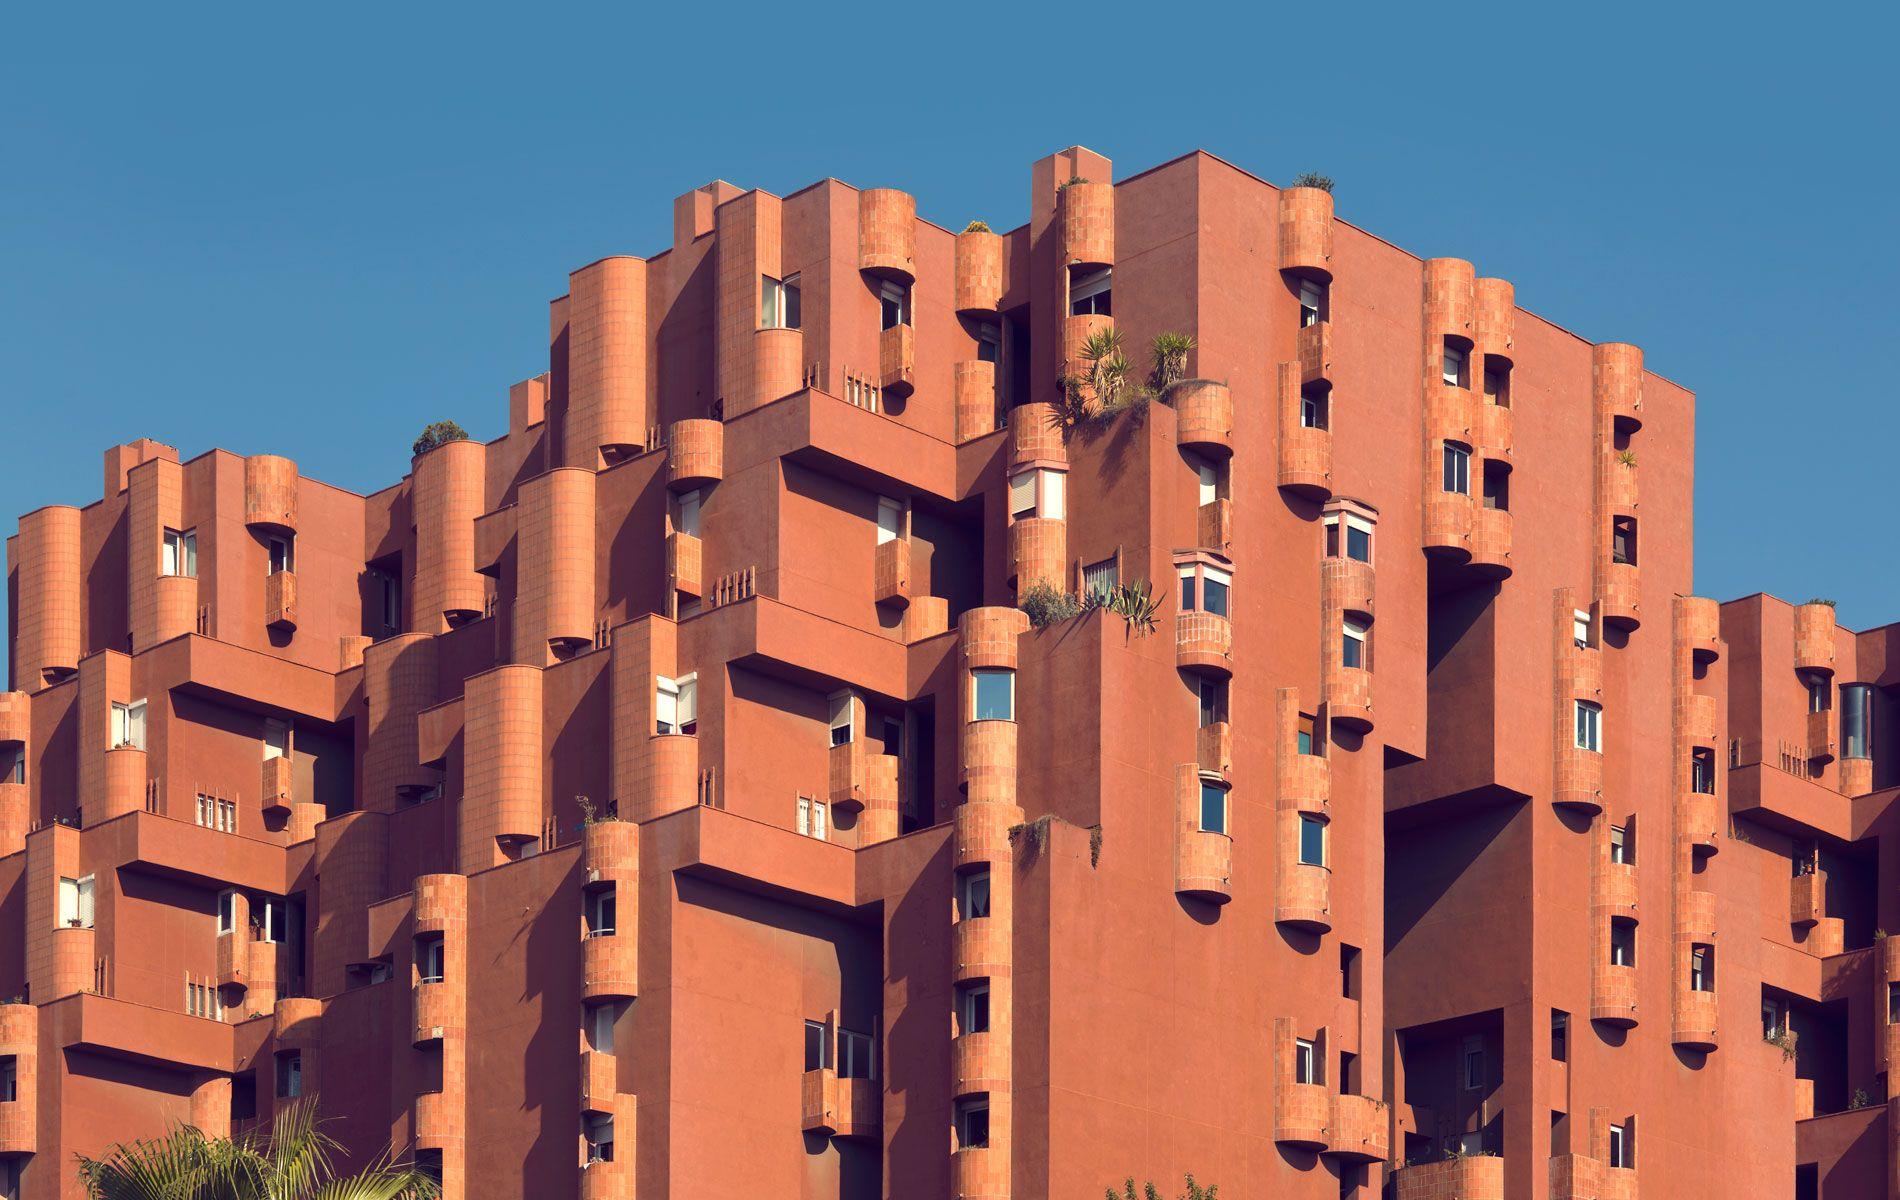 walden 7 1975 sant just desvern barcelona spain ricardo bofill taller de arquitectura. Black Bedroom Furniture Sets. Home Design Ideas